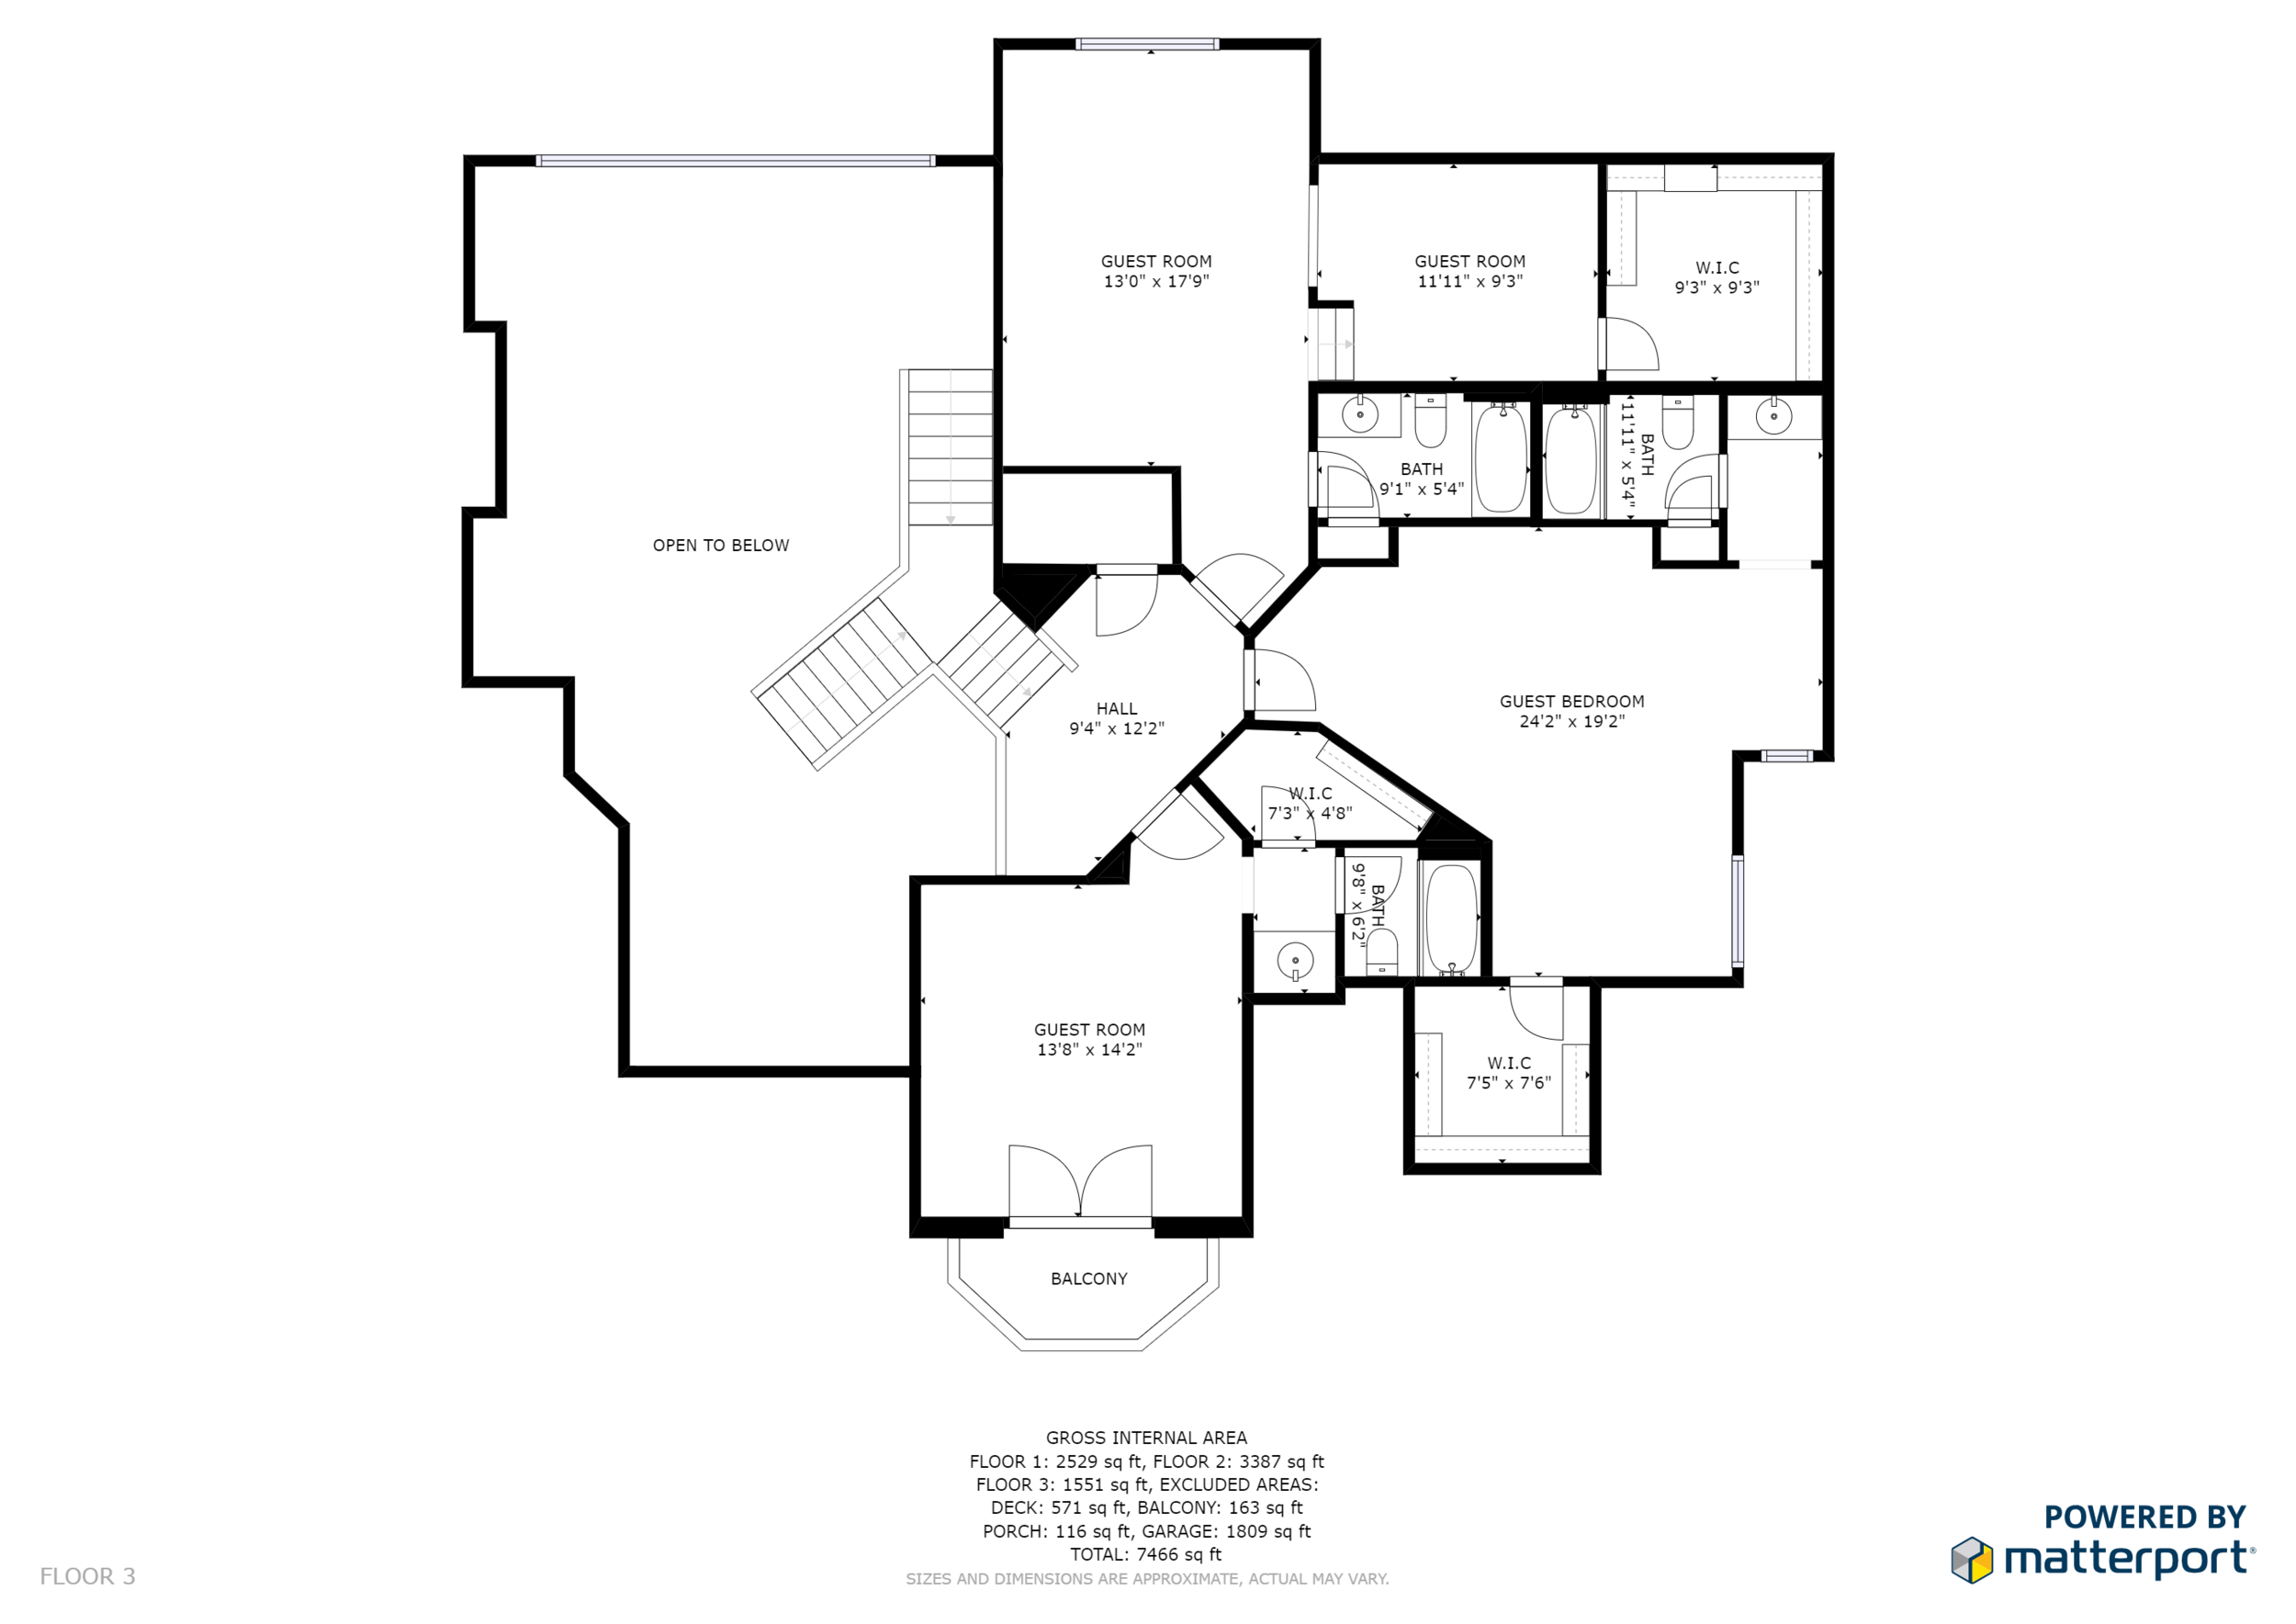 Black and White Floor Plan No Branding Floor 3